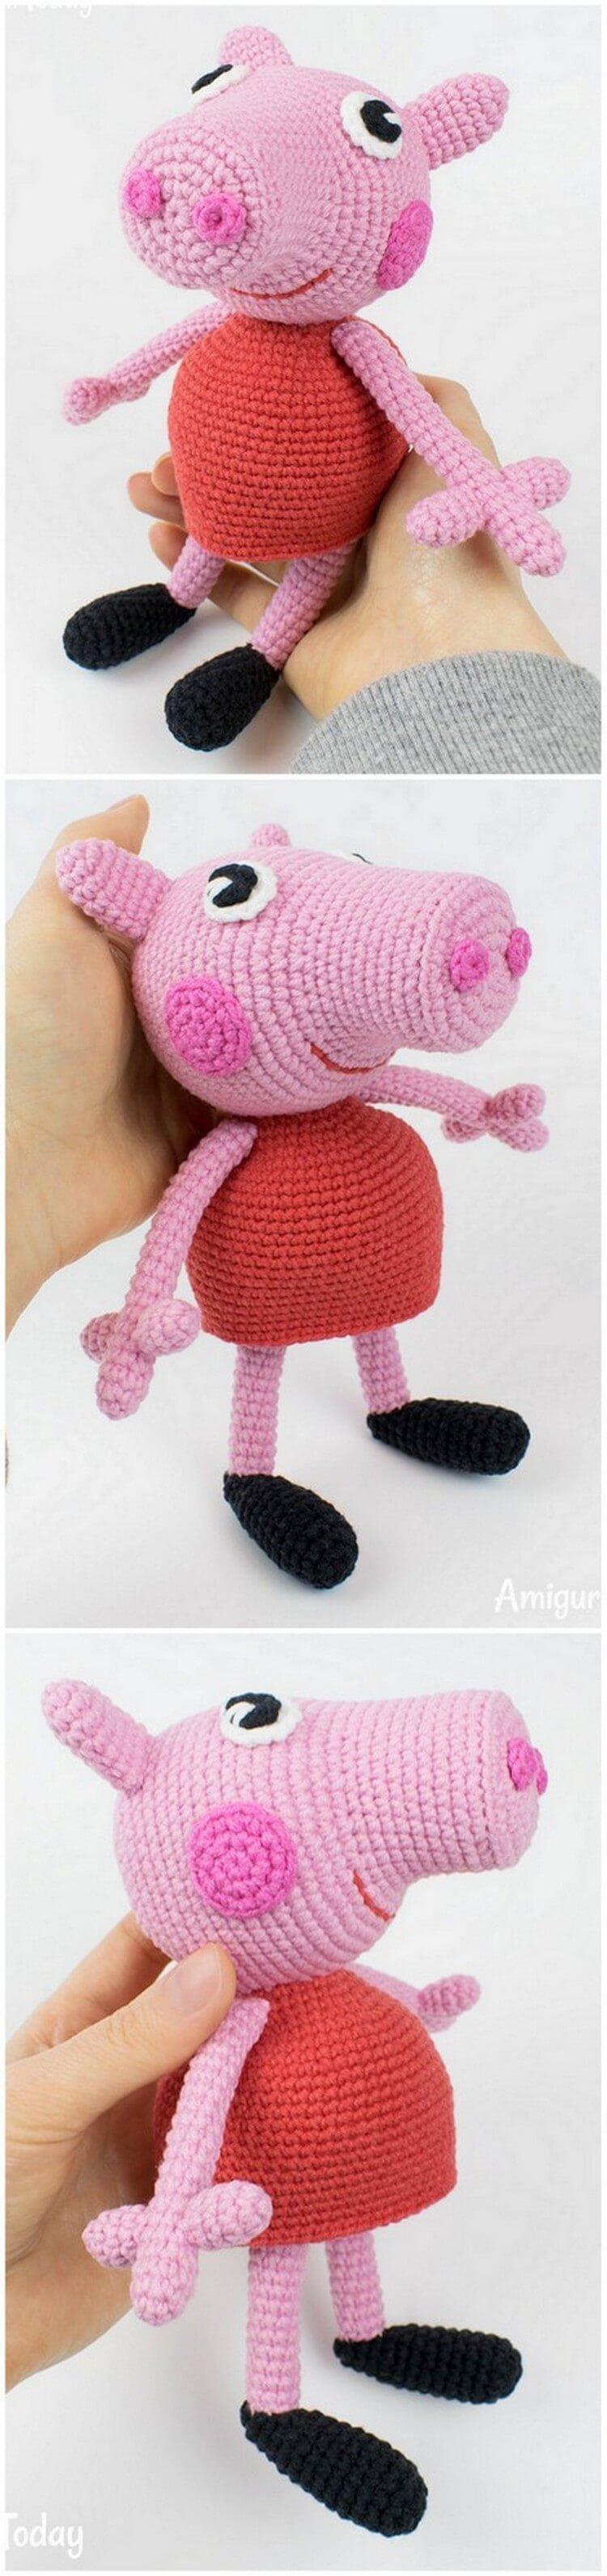 Crochet Amigurumi Pattern (61)